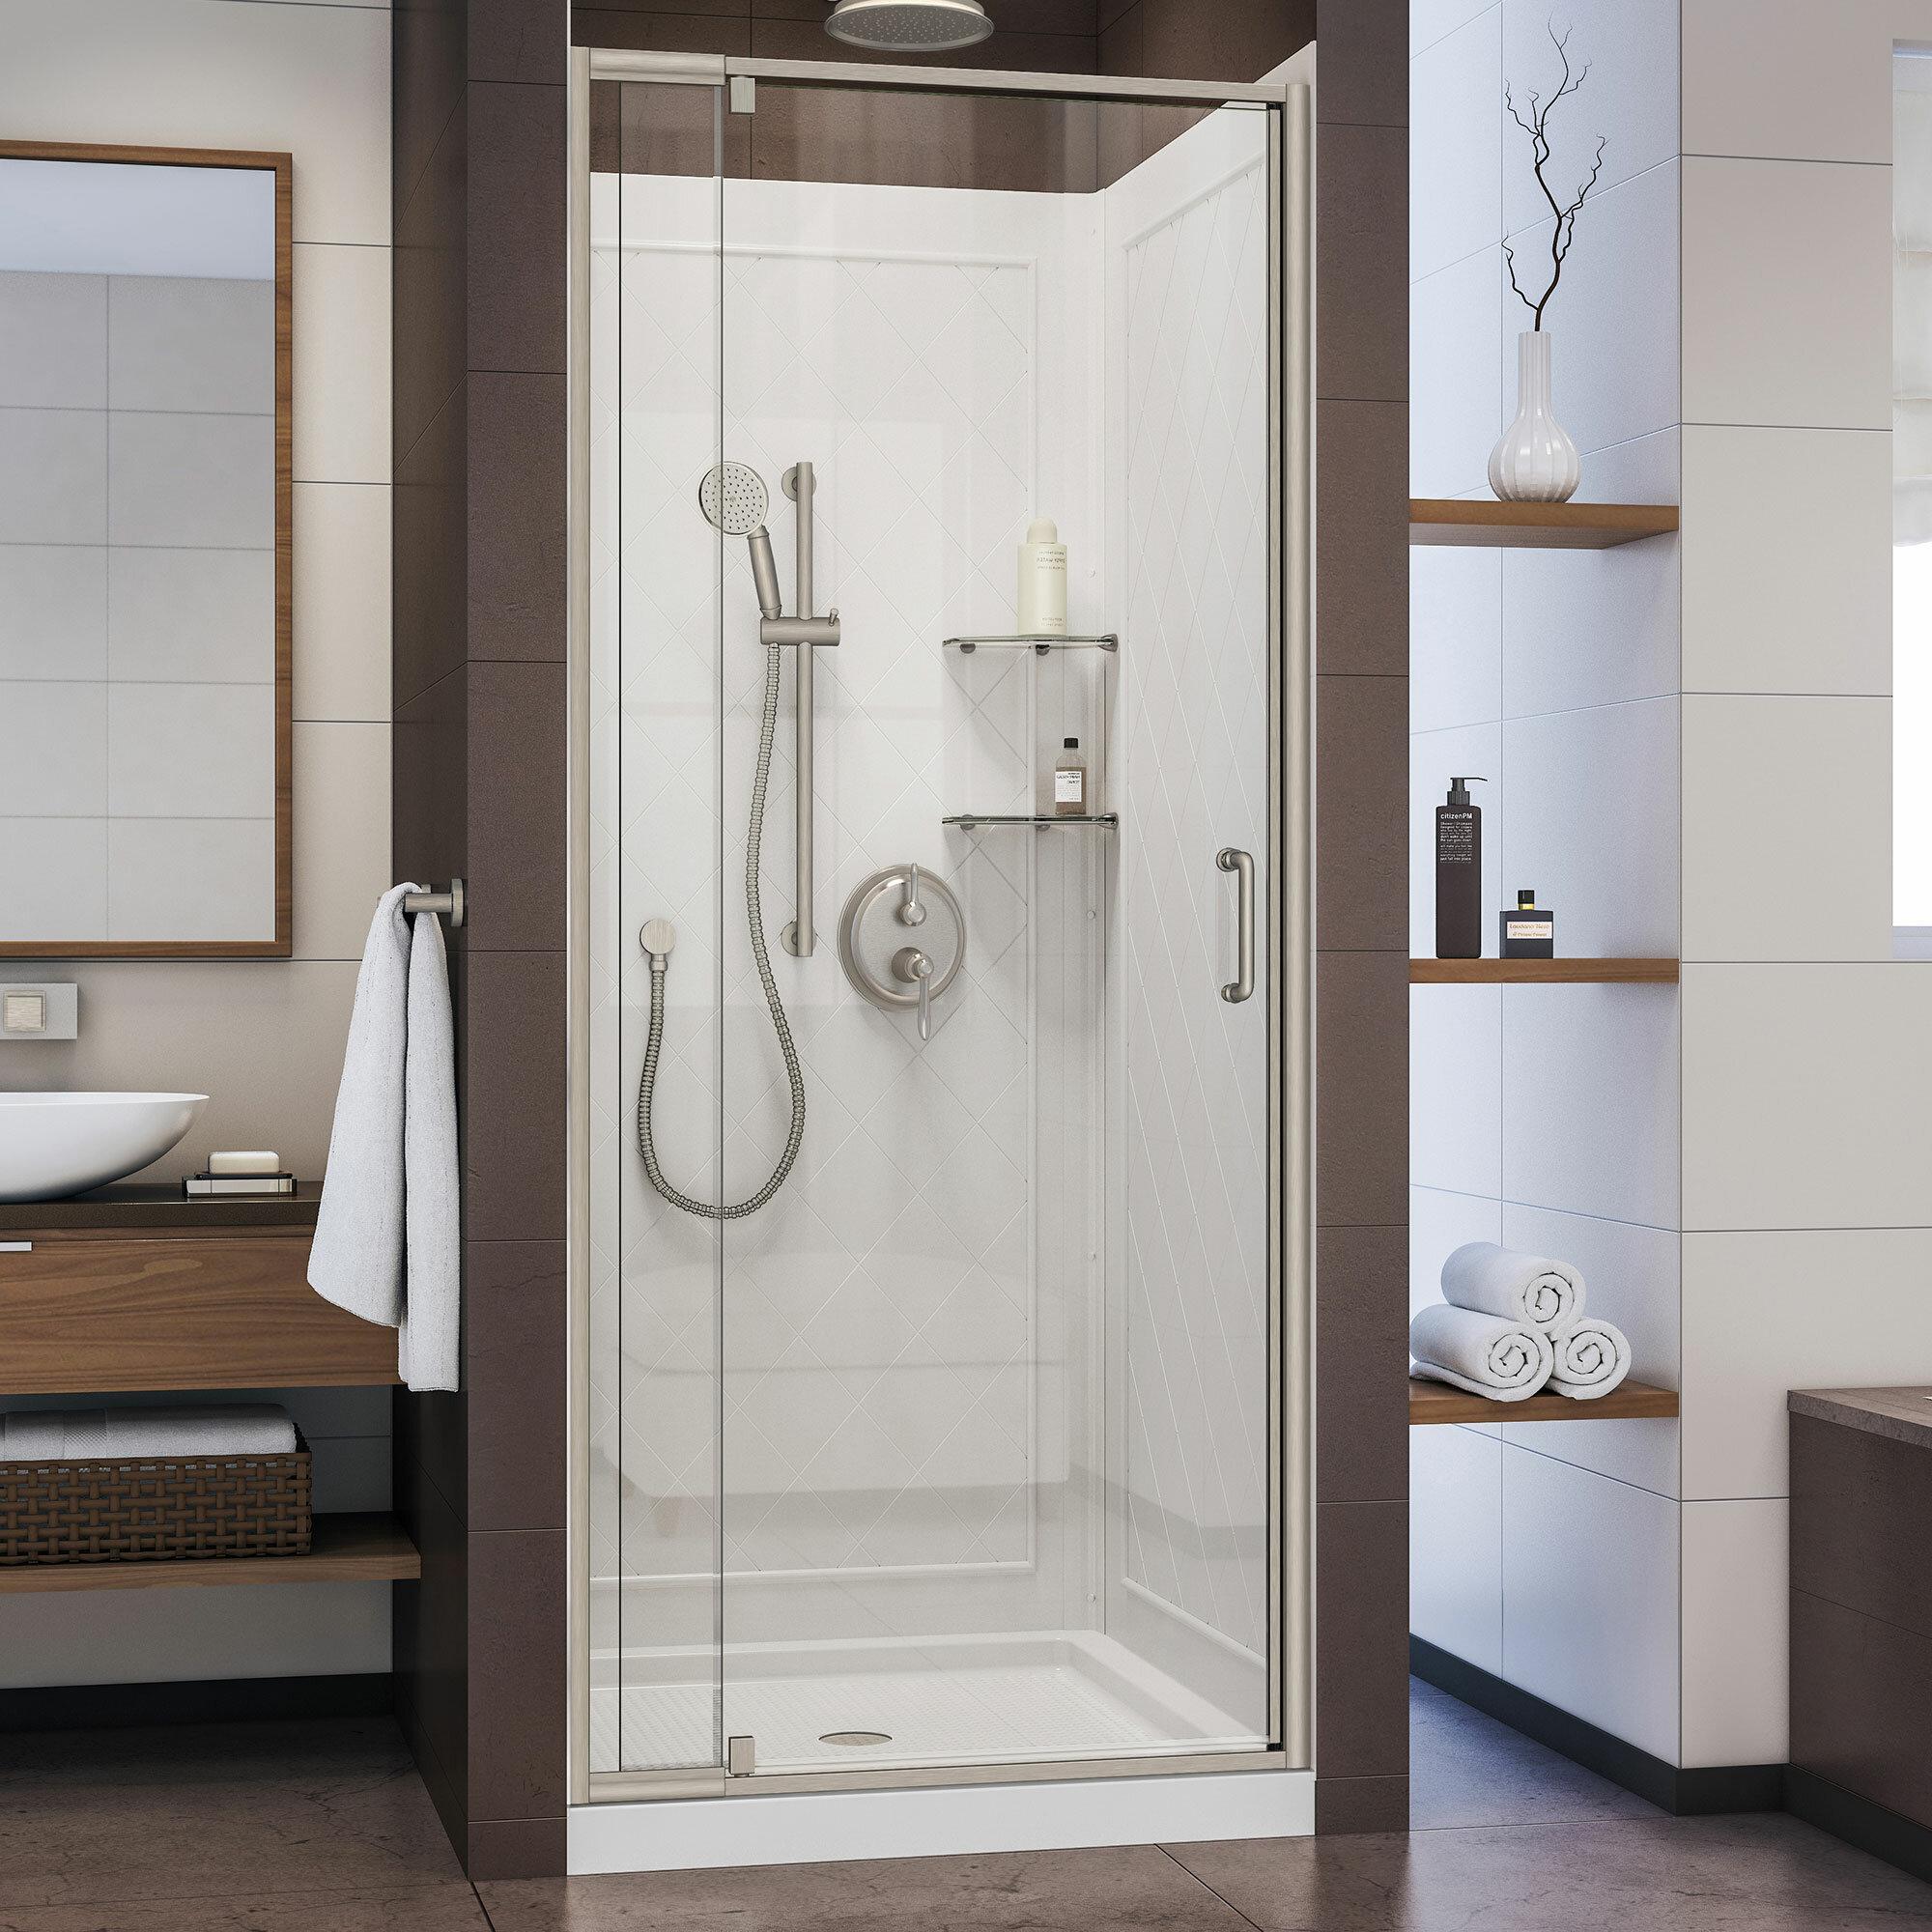 Dreamline Flex 32 X 76 75 Square Pivot Shower Enclosure With Base Included Wayfair